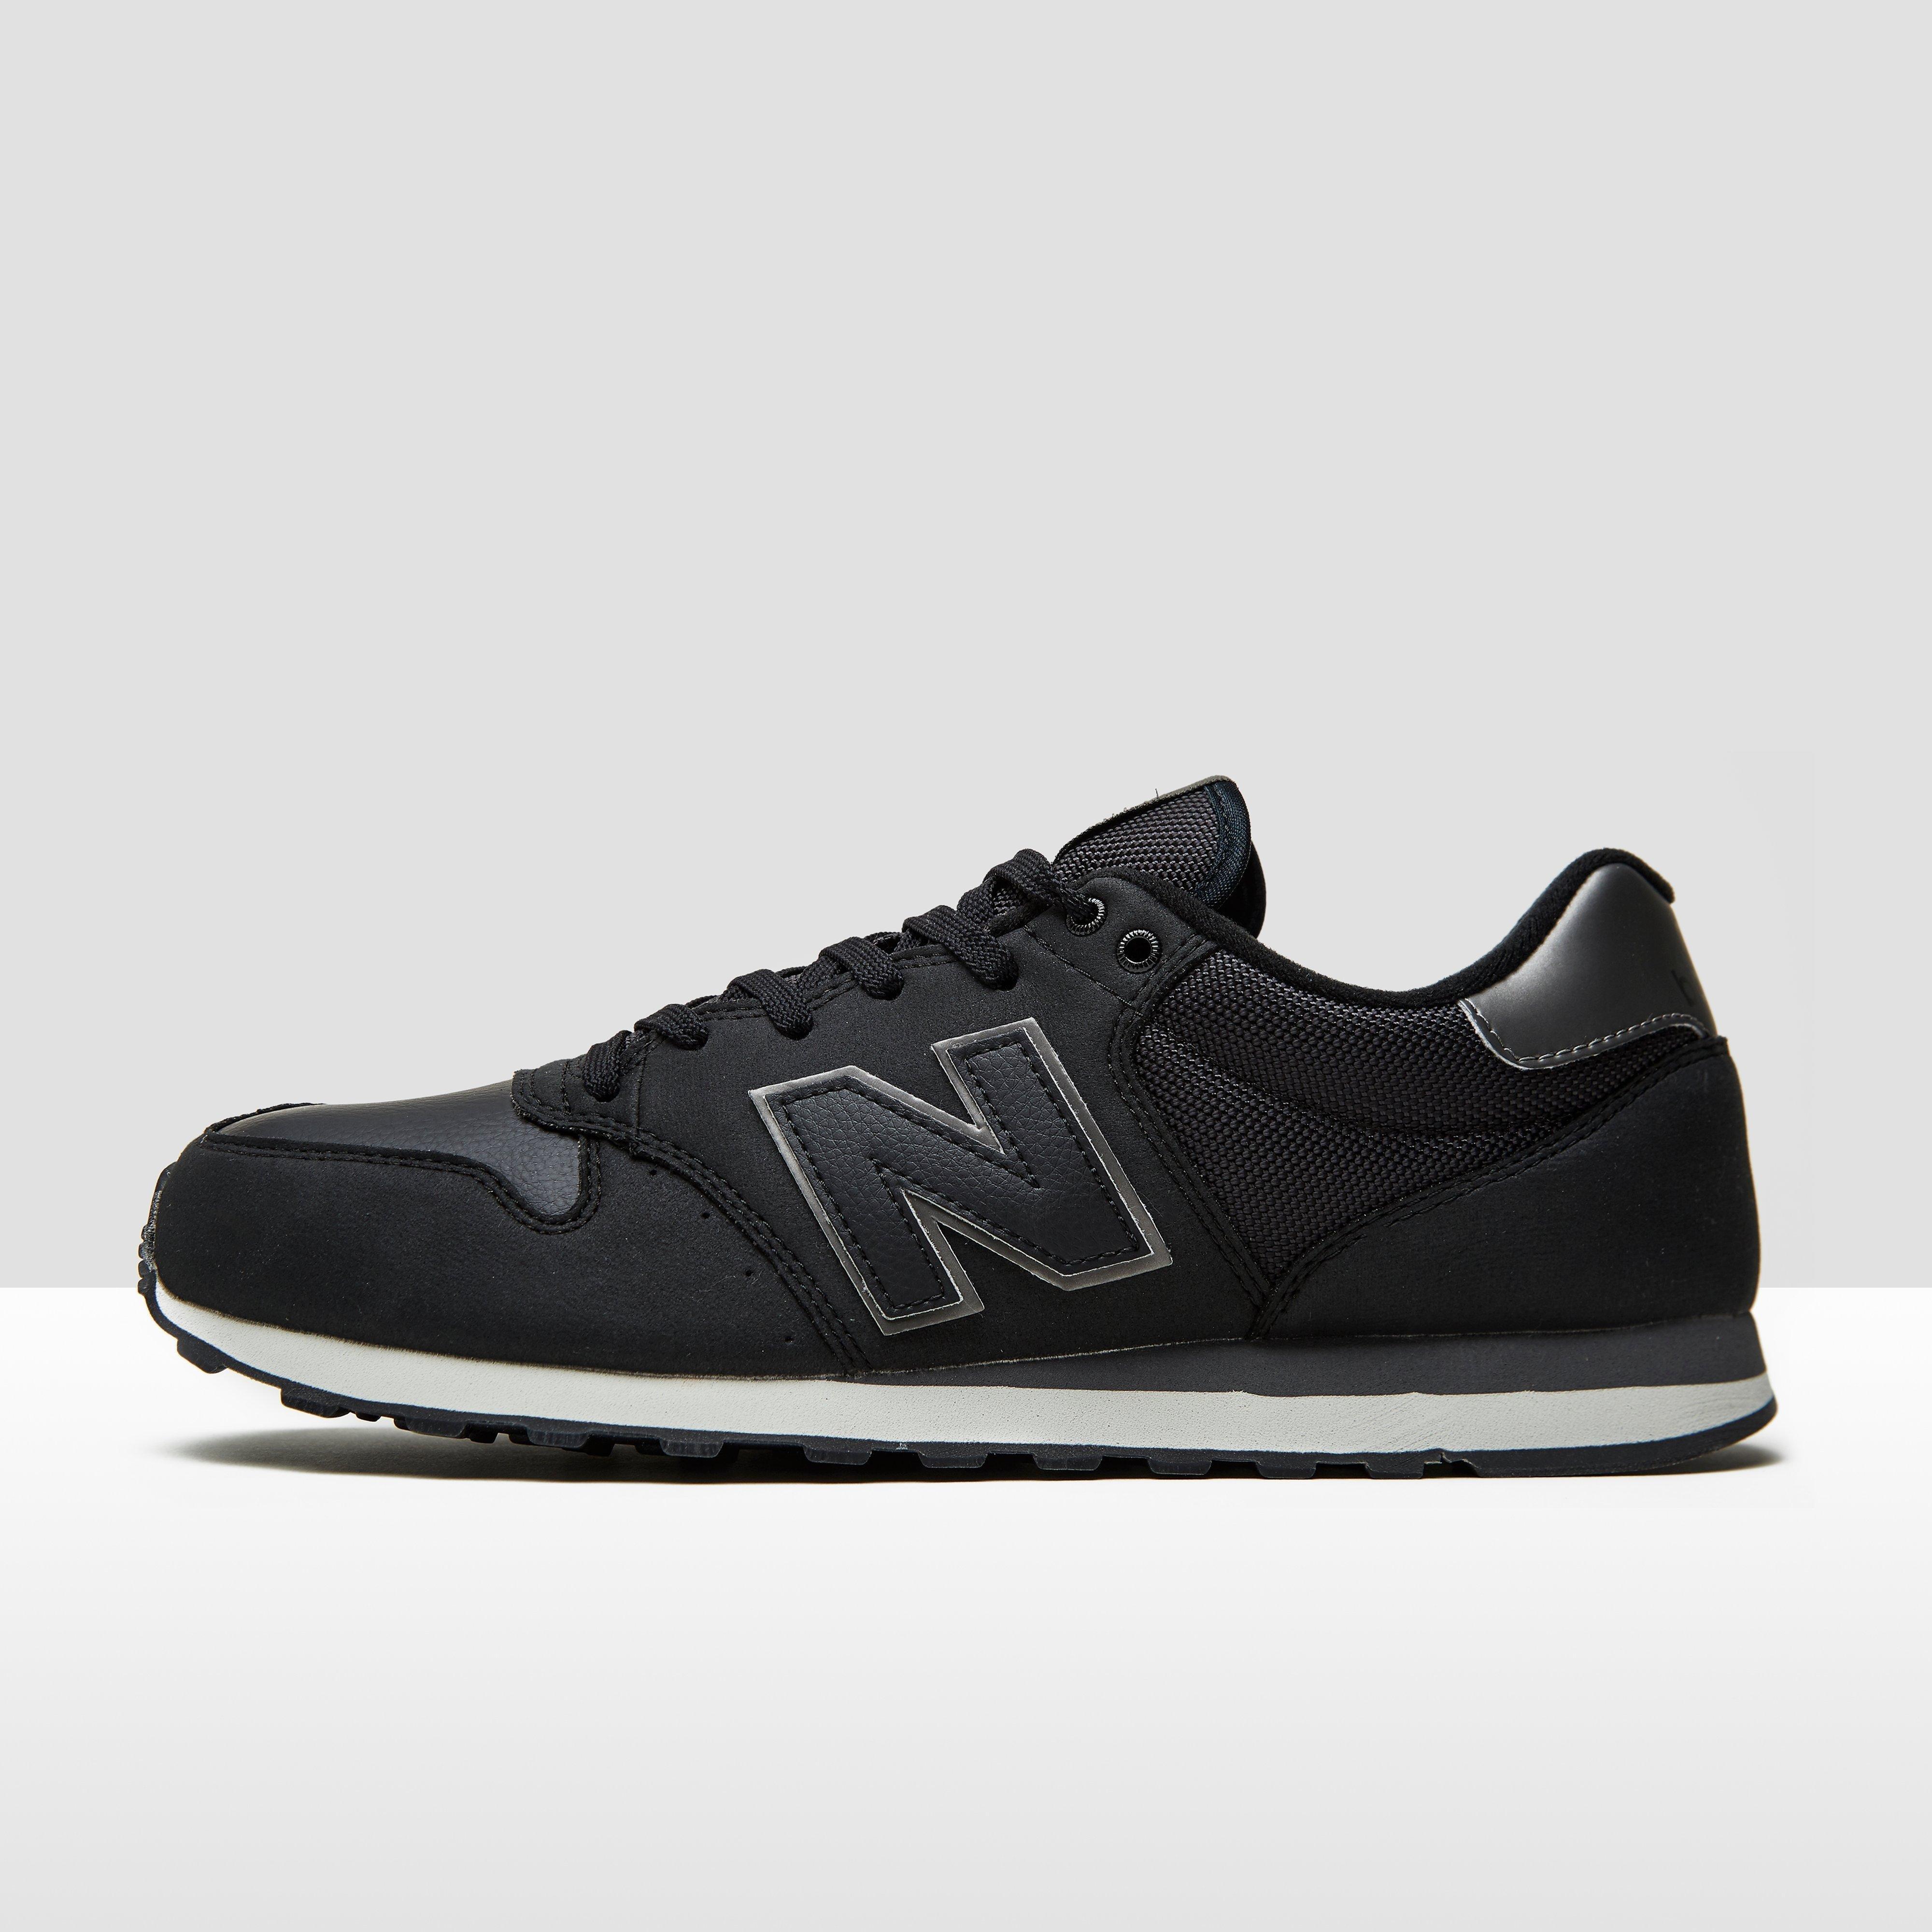 Noir Chaussures New Balance En Taille 45 Hommes lEDPyu